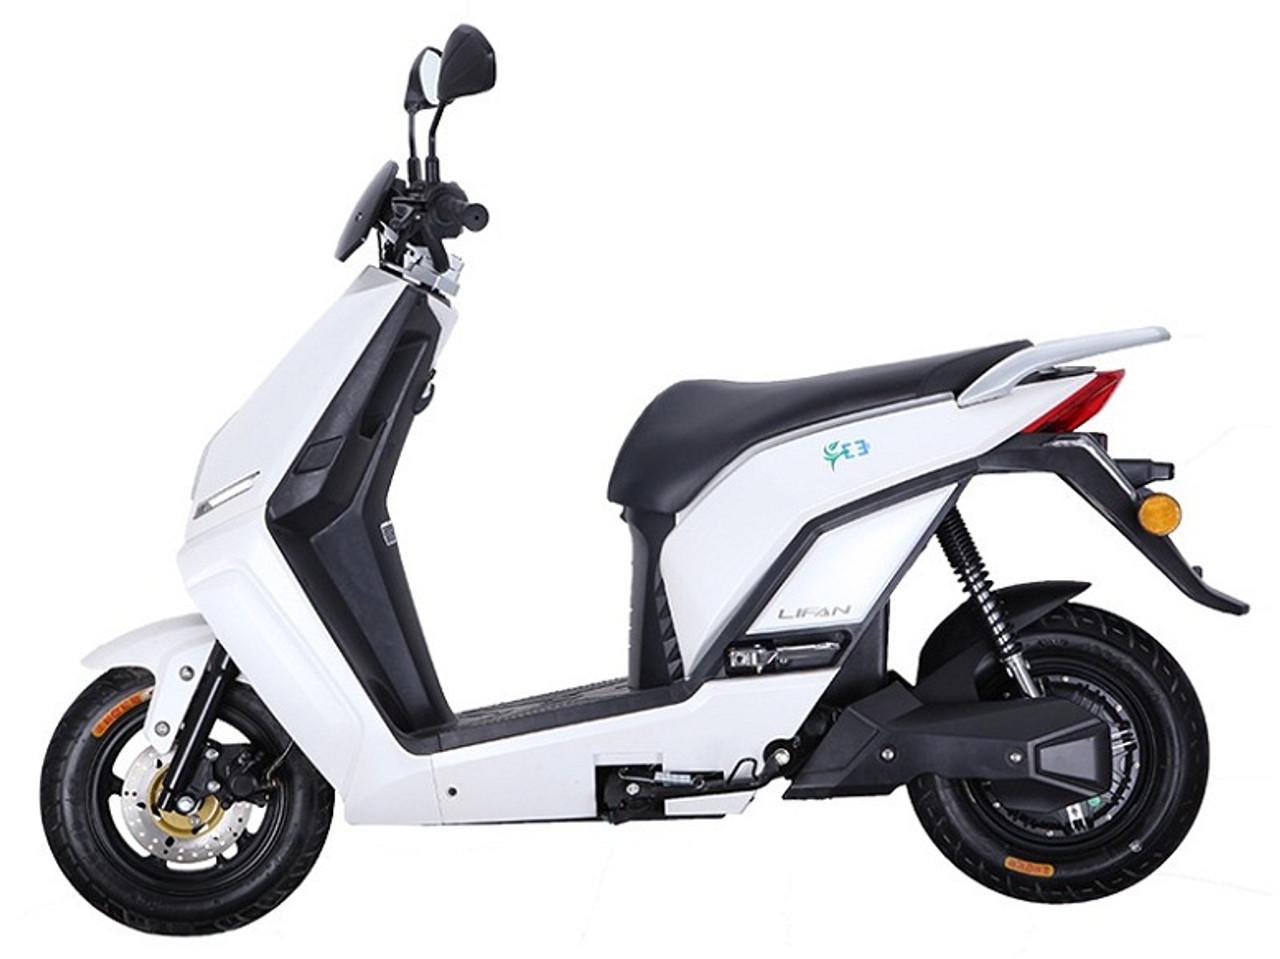 Lifan Venom E3 Scooter, 1200W 60V Lithium Electric Street Legal